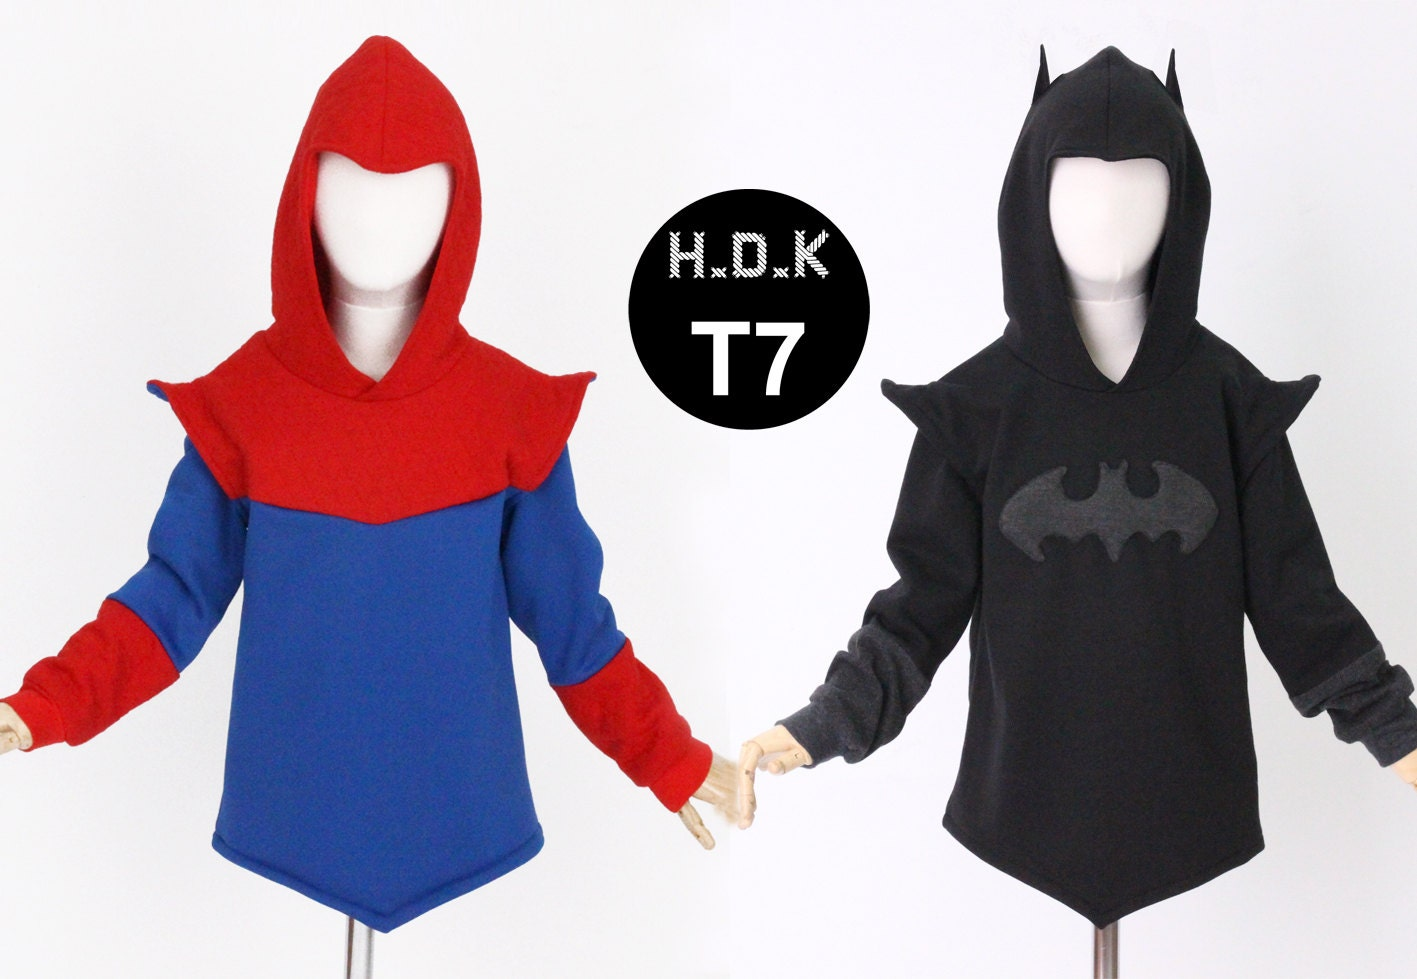 Kids sewing pattern pdf2 in 1 pattern kids batman hoodie zoom jeuxipadfo Images